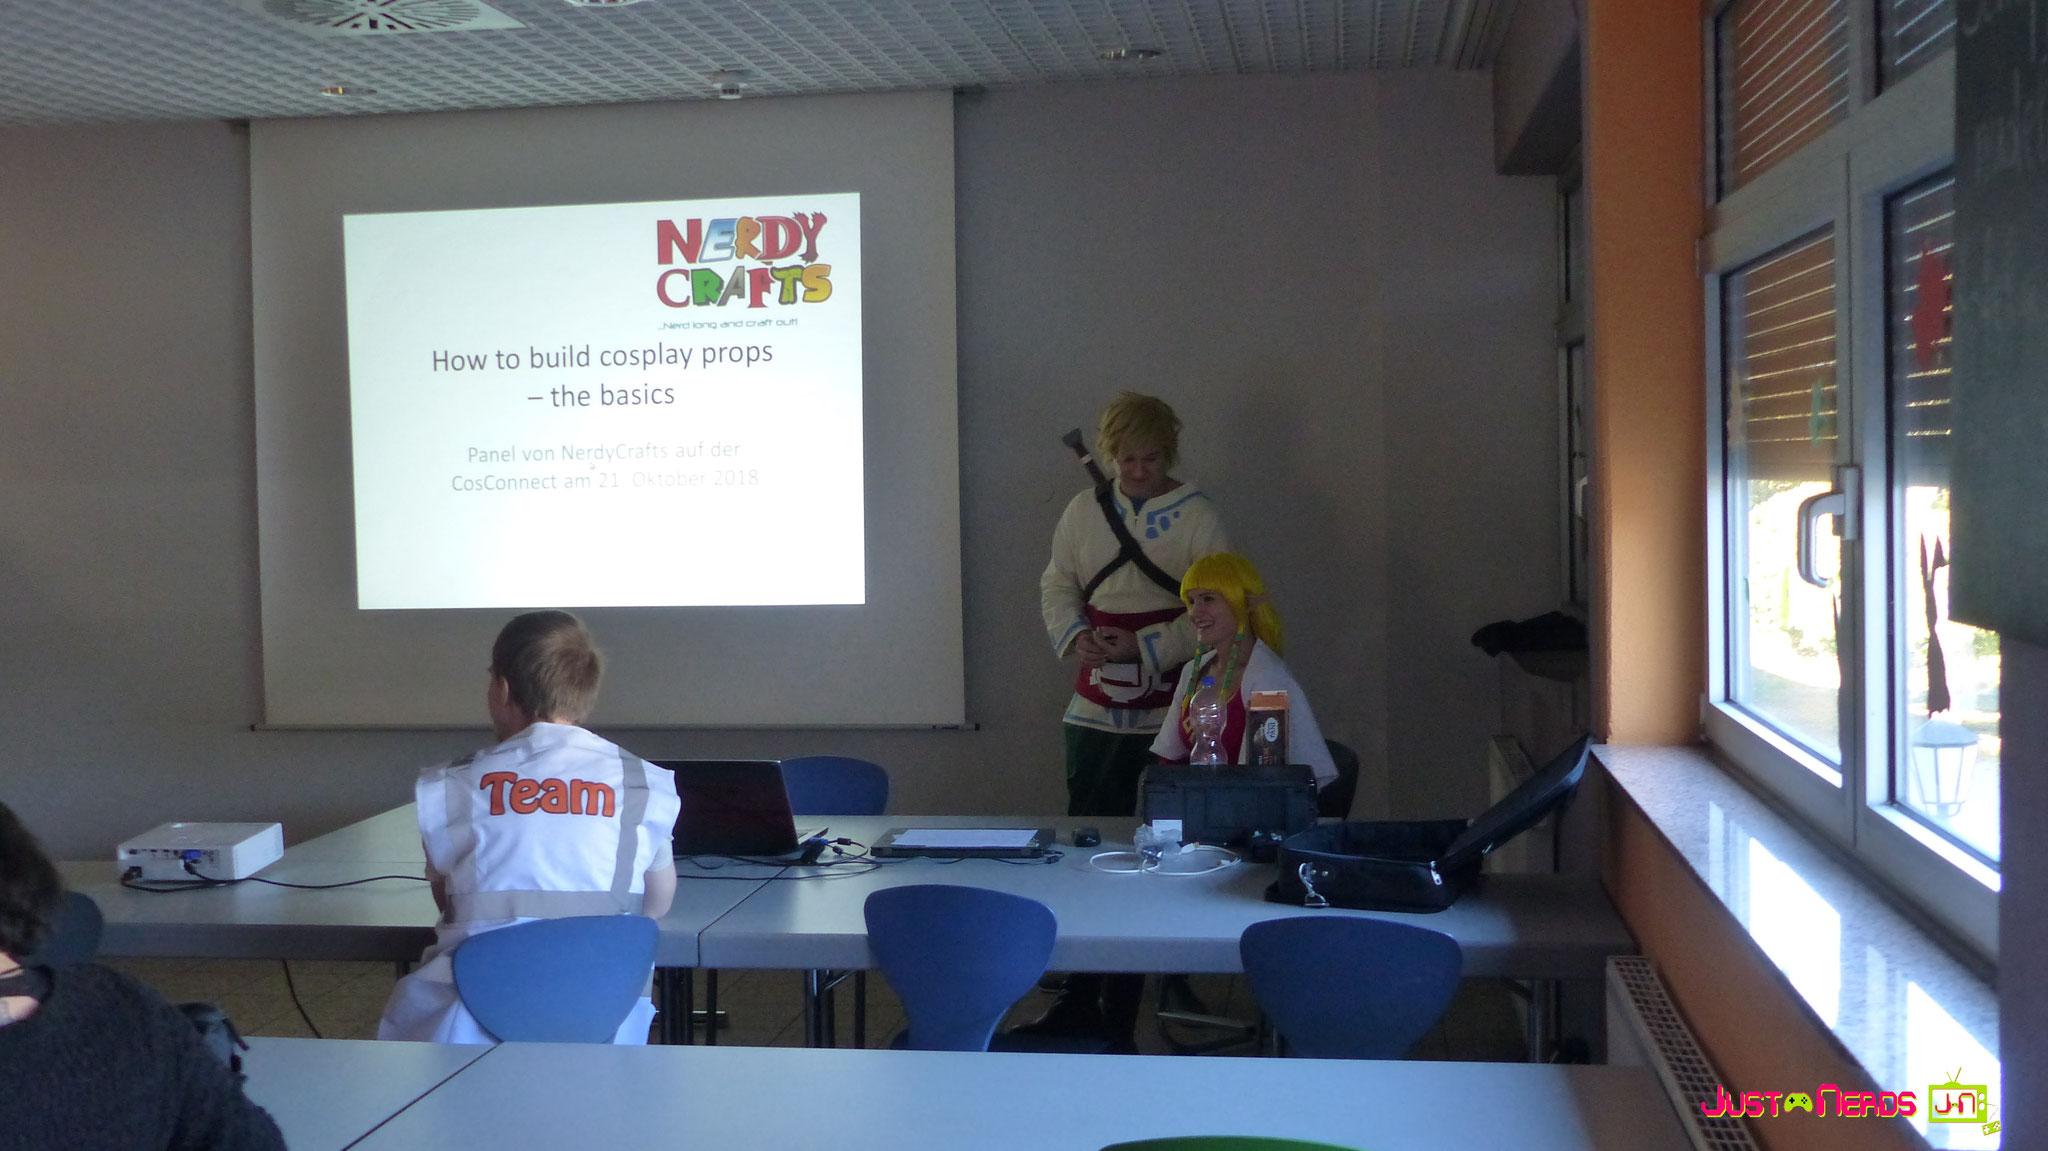 Nerdy Crafts Vortrag zum Thema Waffenbau